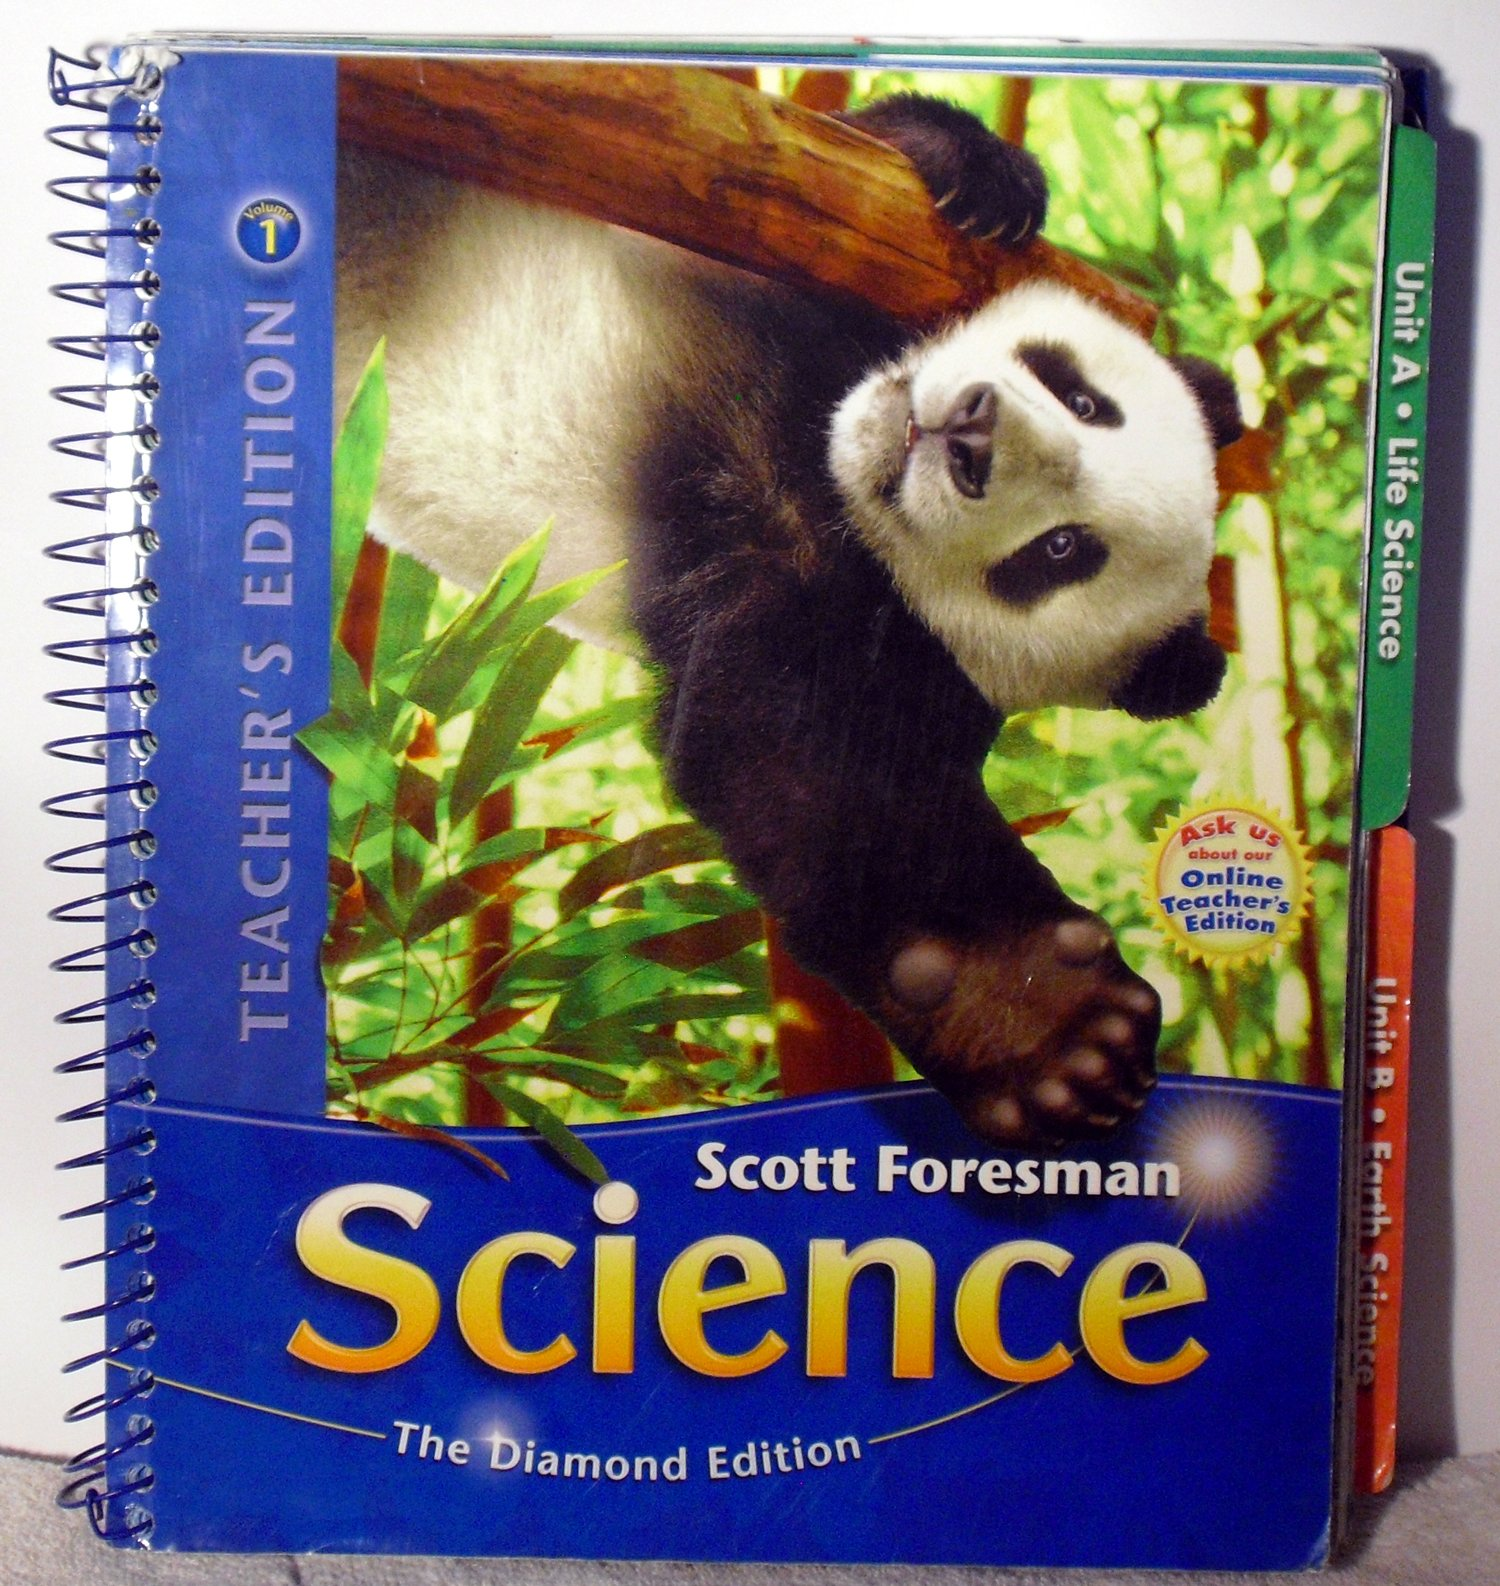 Scott Foresman Science Grade 4 Teacher's Edition (Volume 1) ebook